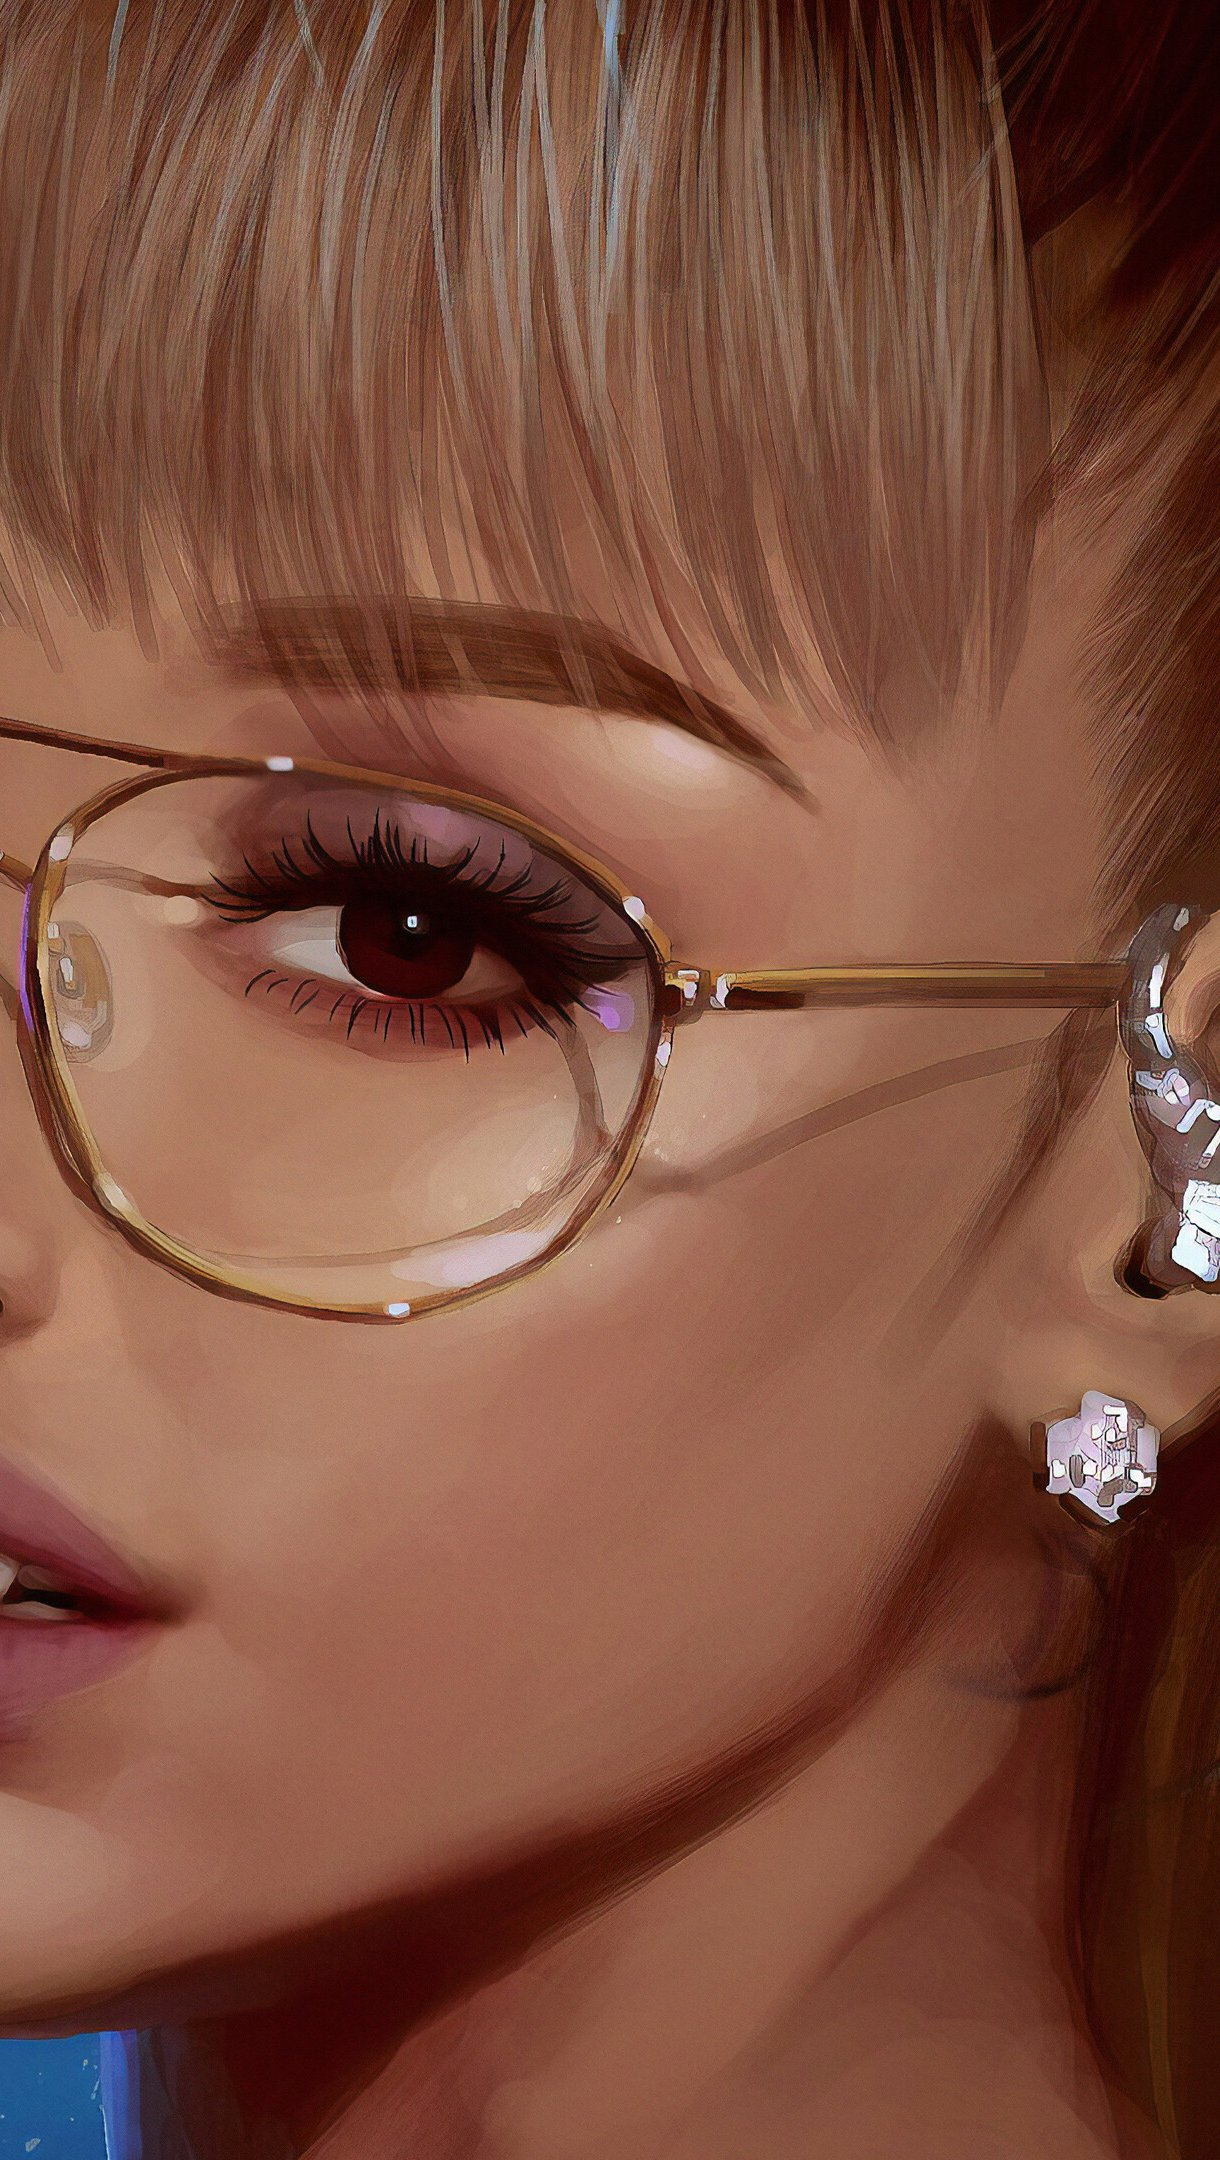 Fondos de pantalla Ariana Grande Fanart Vertical